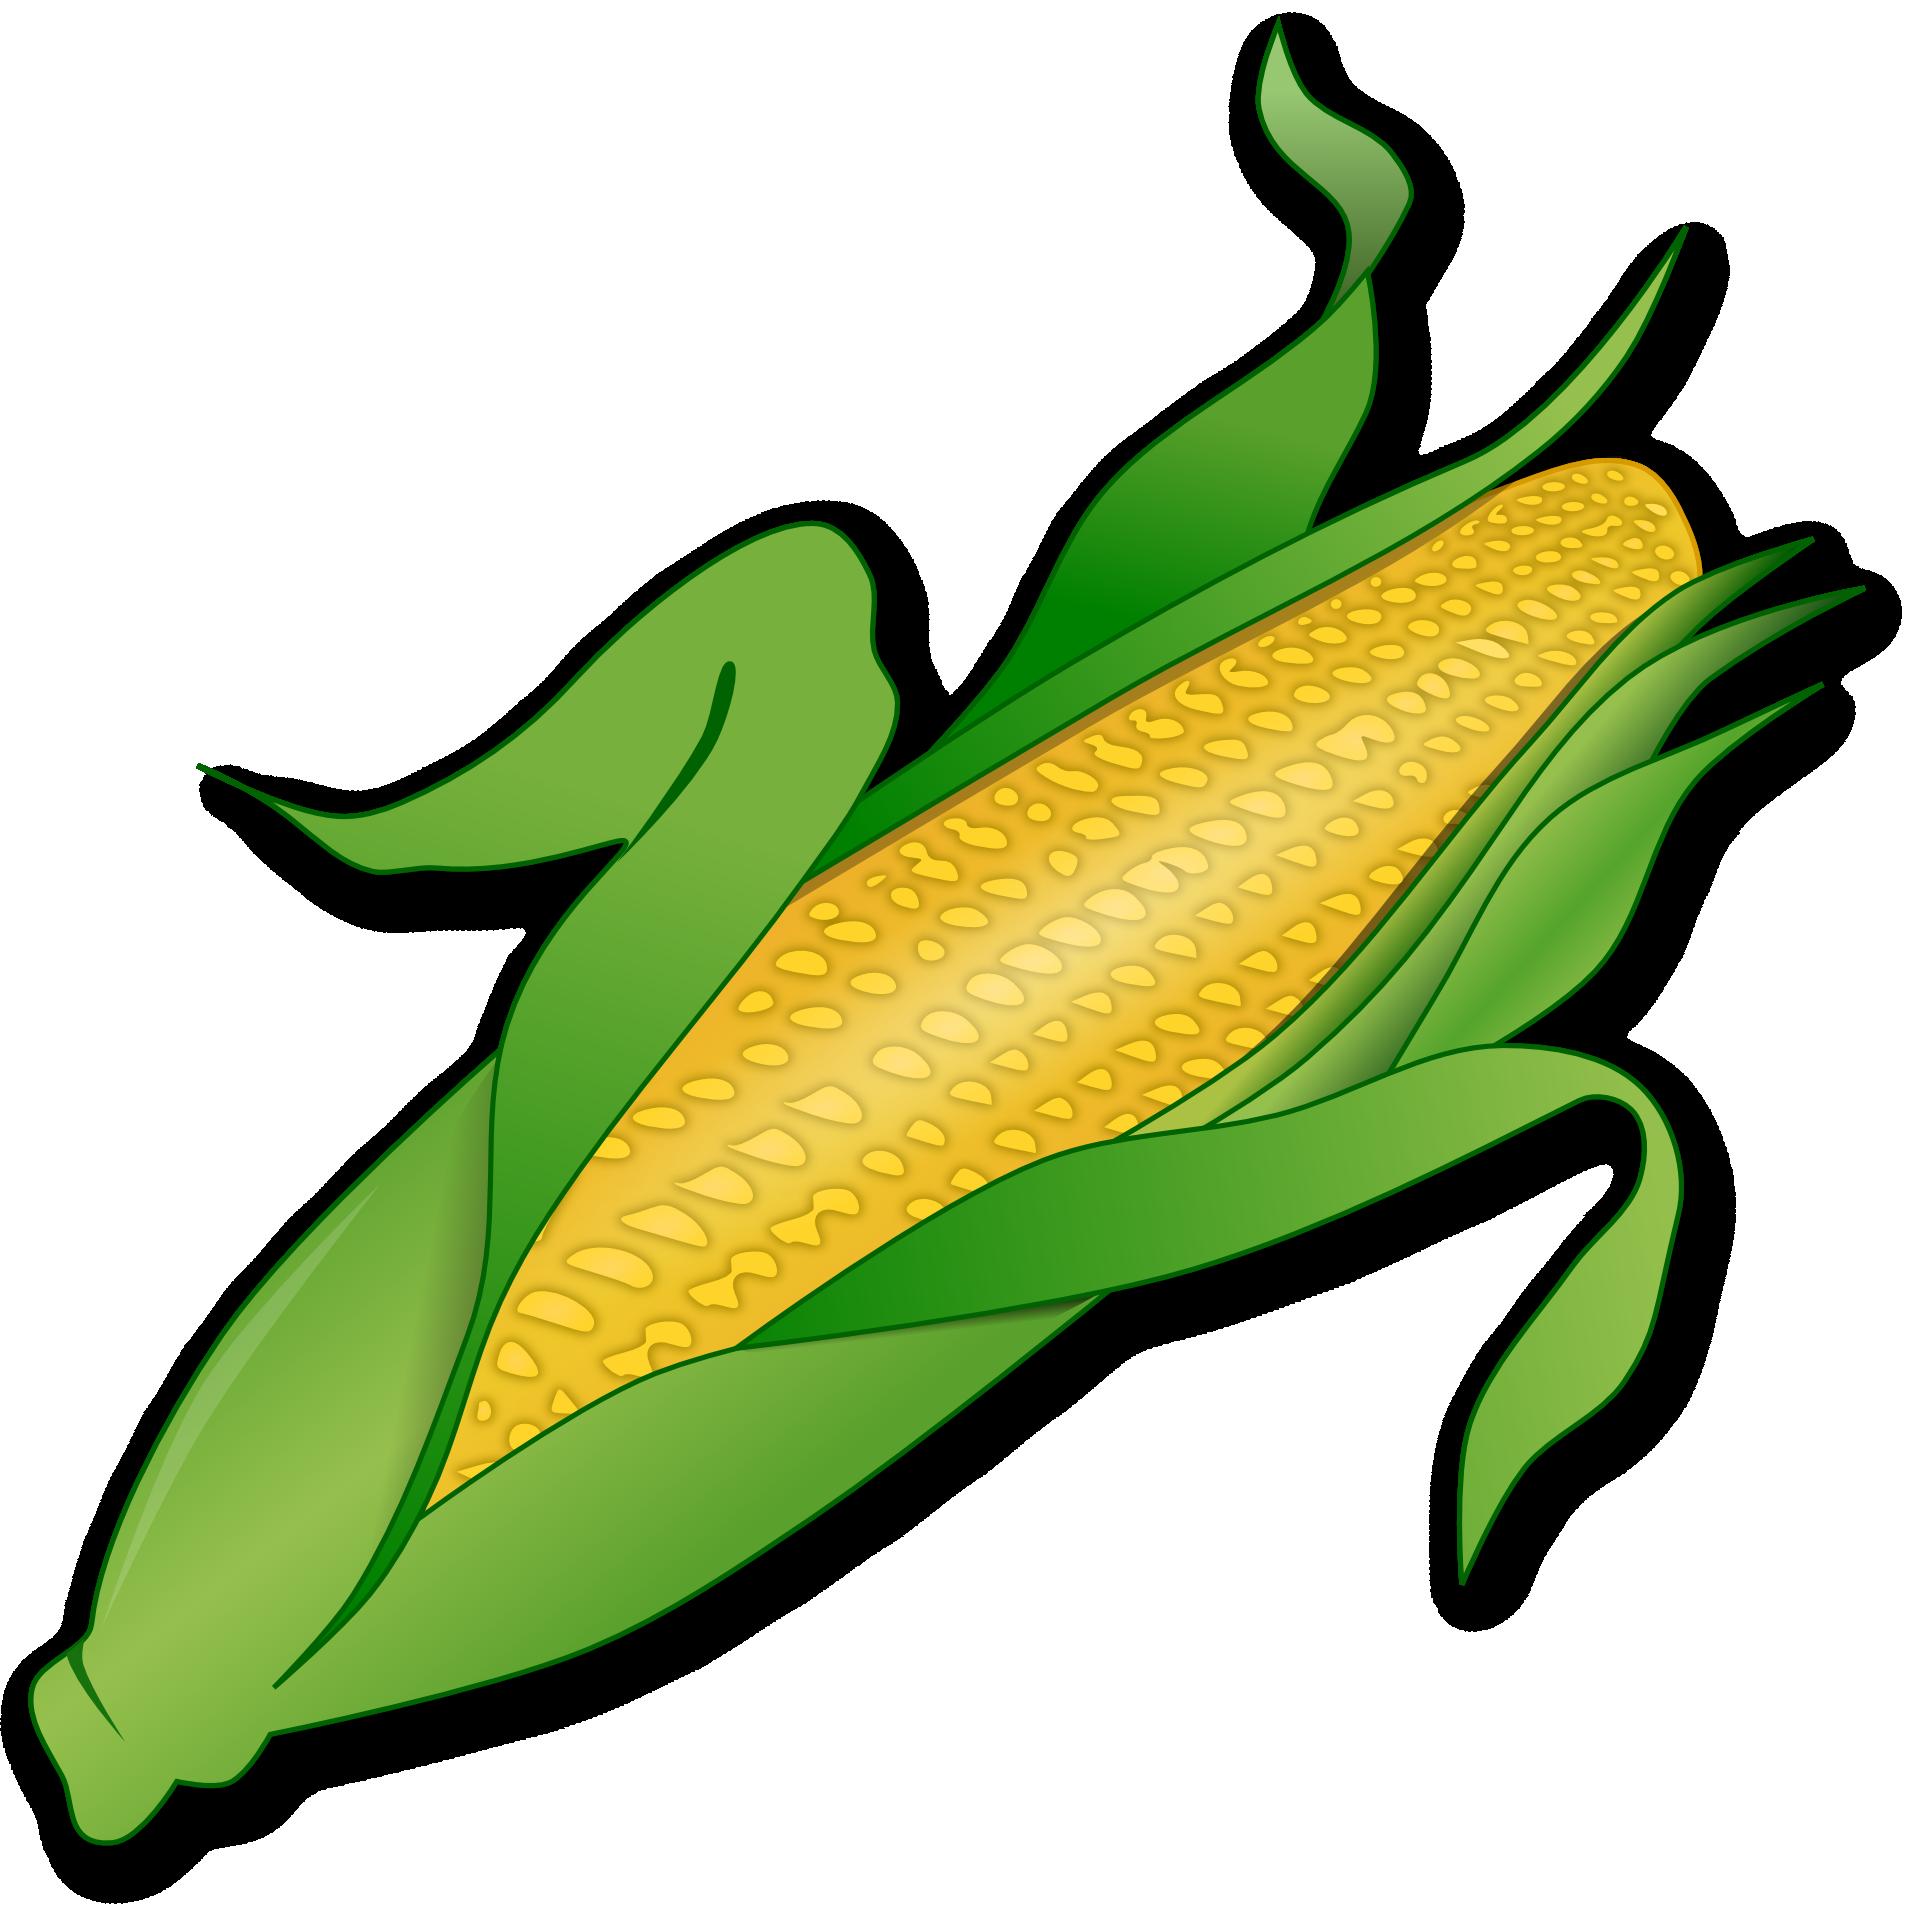 1920x1905 Drawing Of Farm Vegetable Corn Free Image